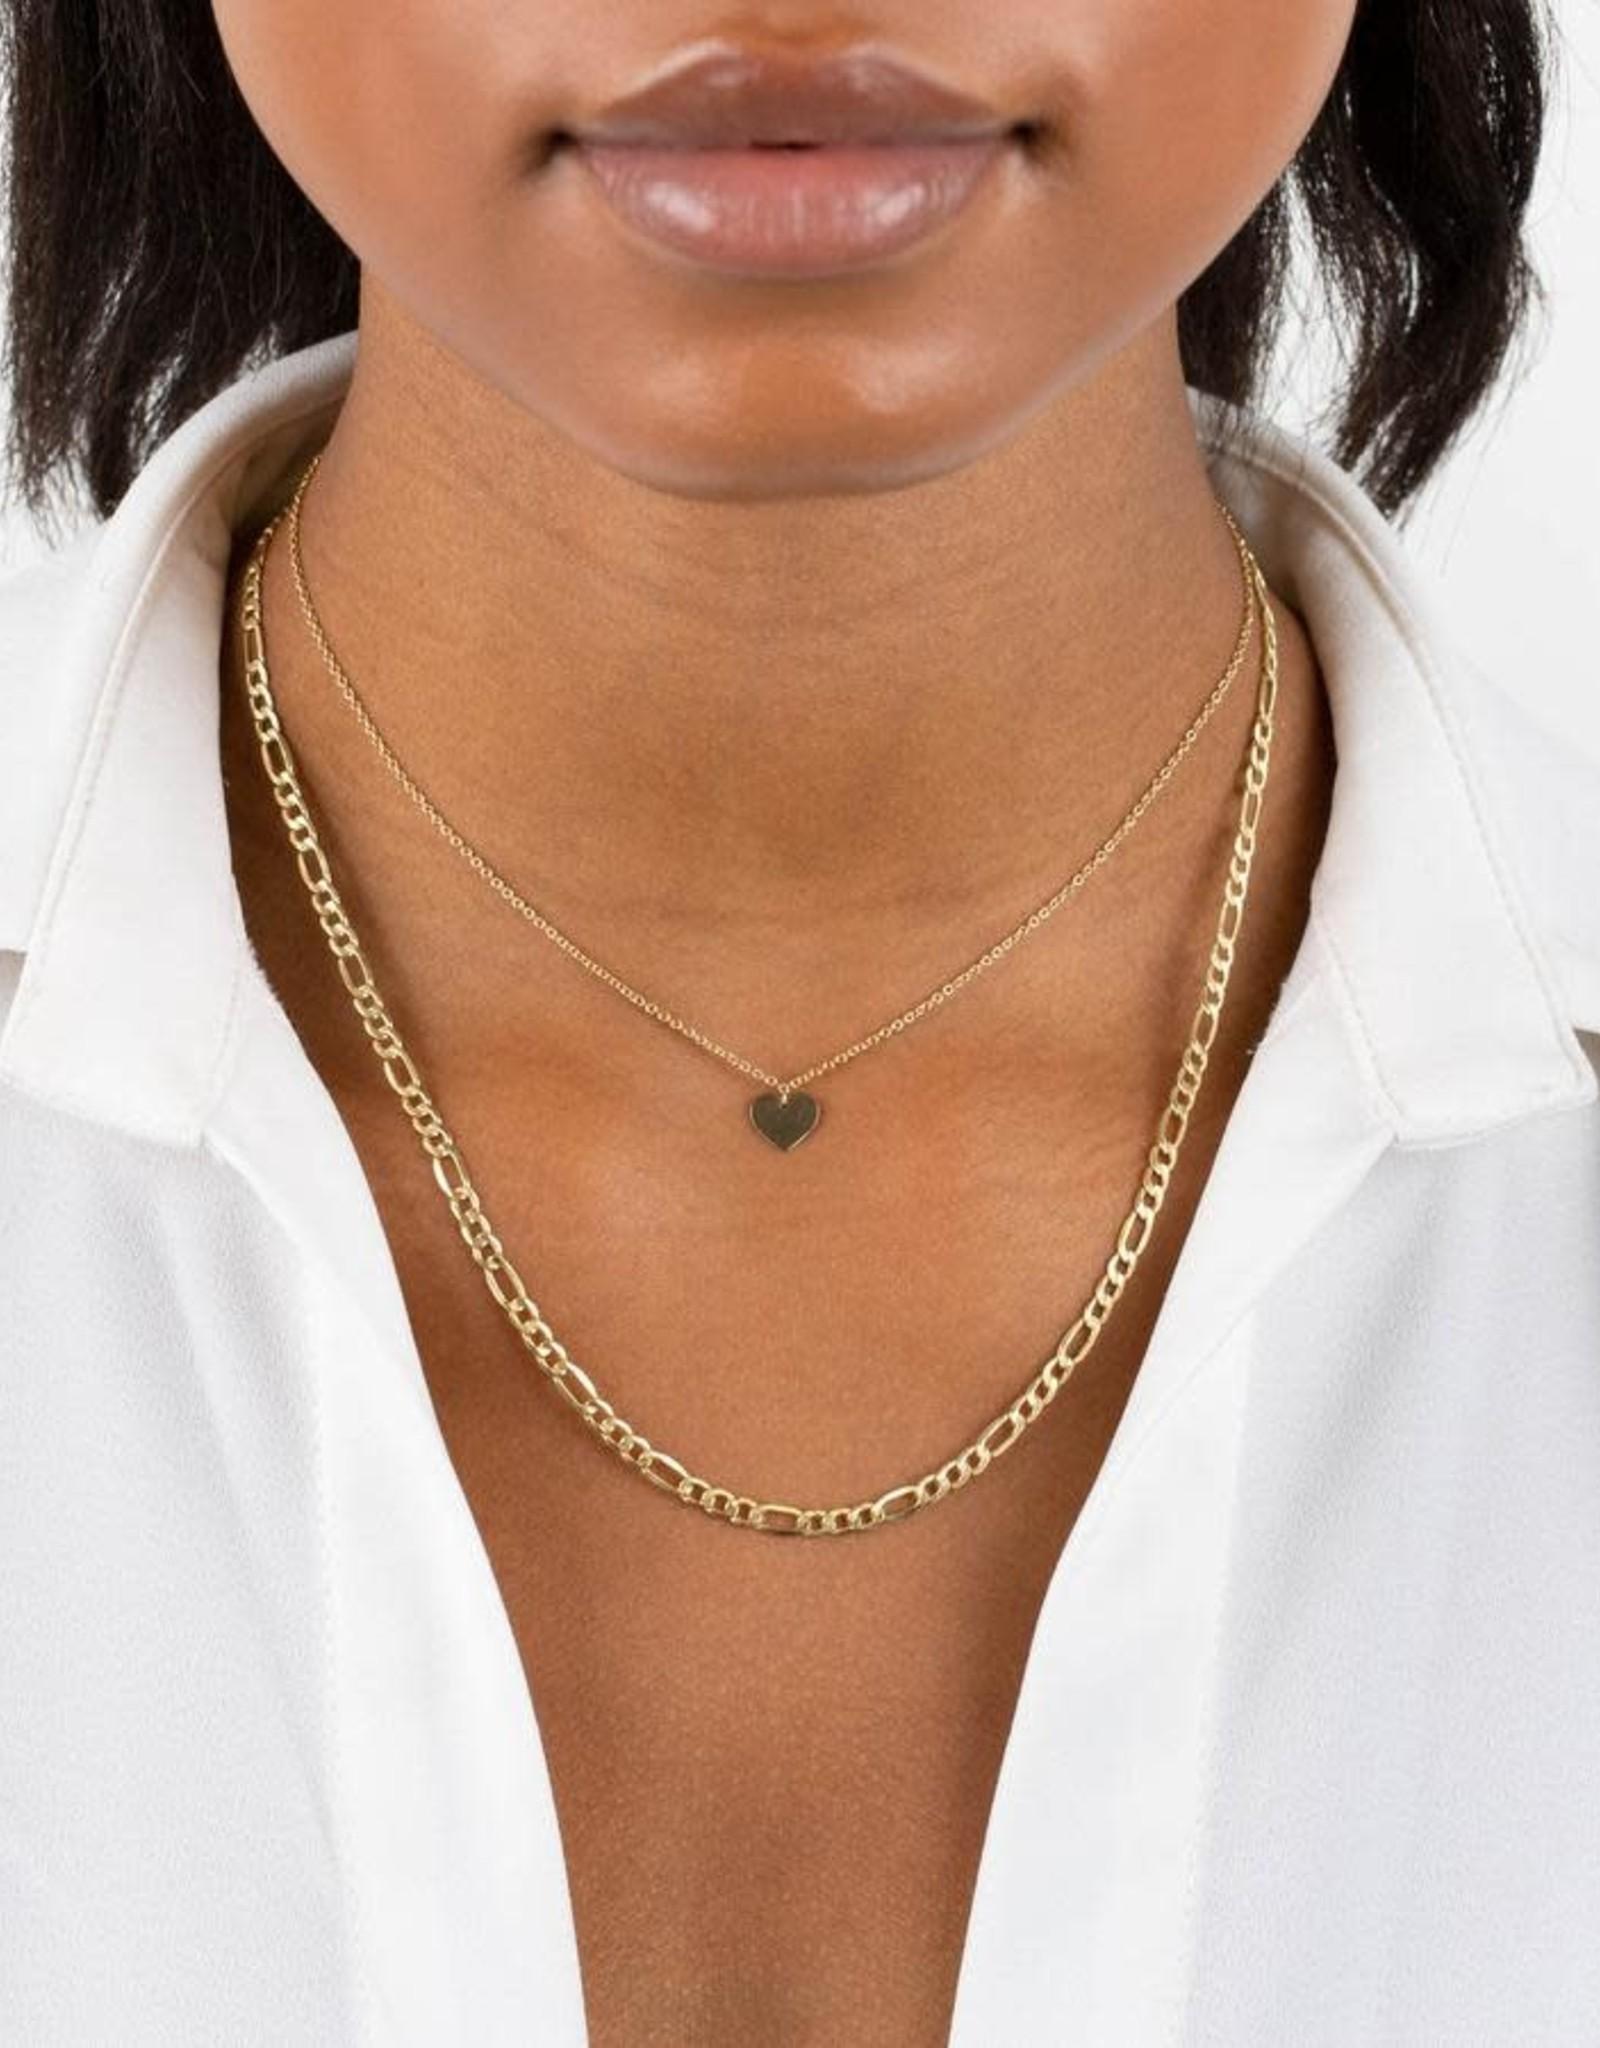 Adinas Figaro Necklace 14in 14K